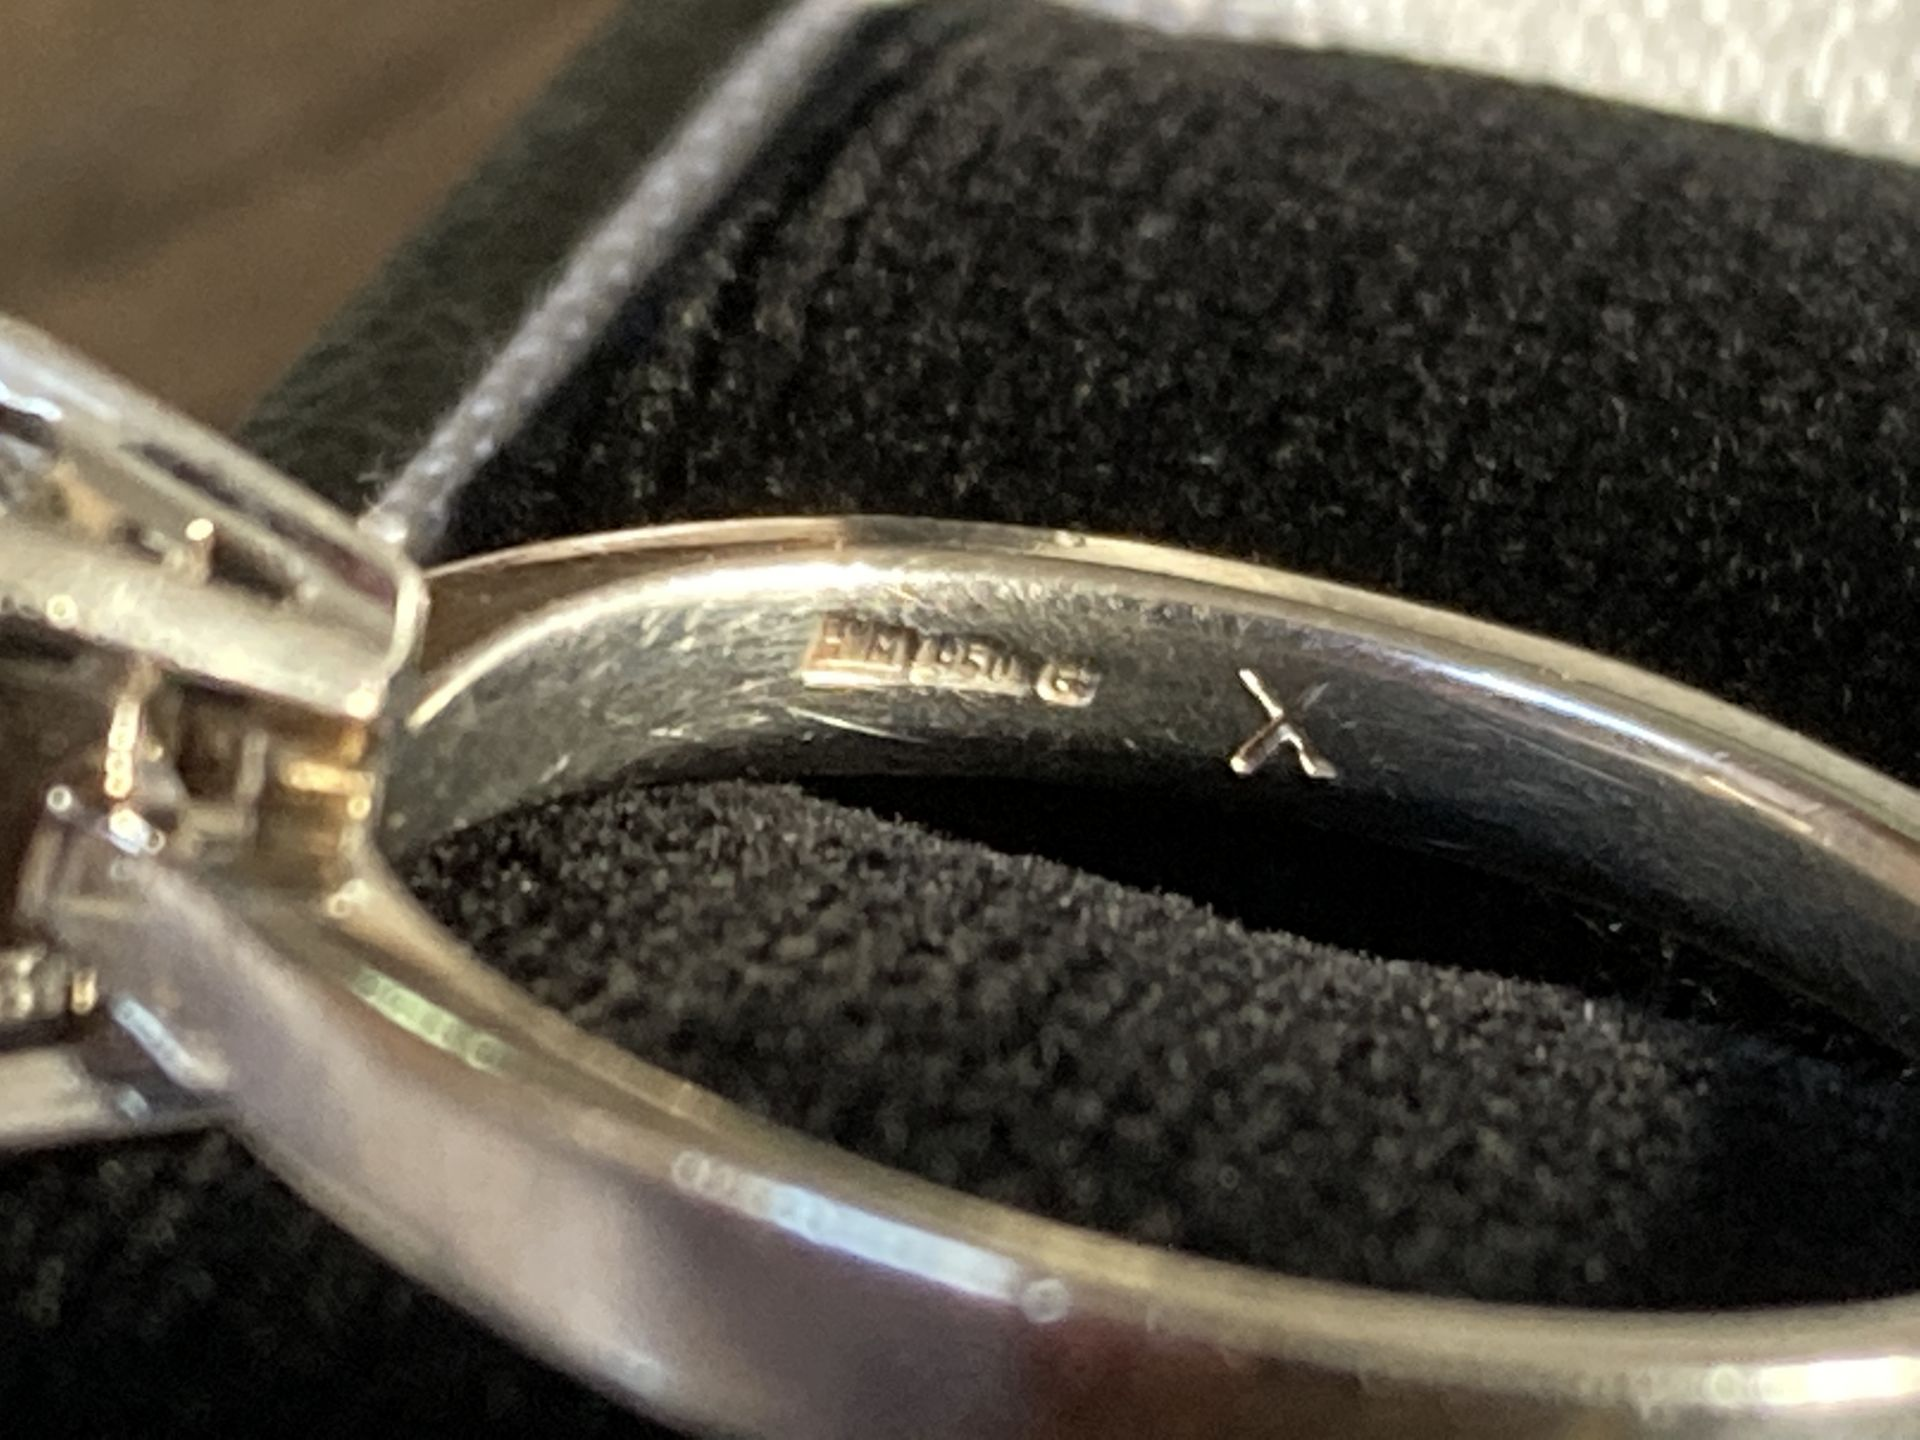 1.04CT (VS/F) PLATINUM PRINCESS CUT DIAMOND SOLITAIRE RING (CERTIFICATED) - Image 10 of 10